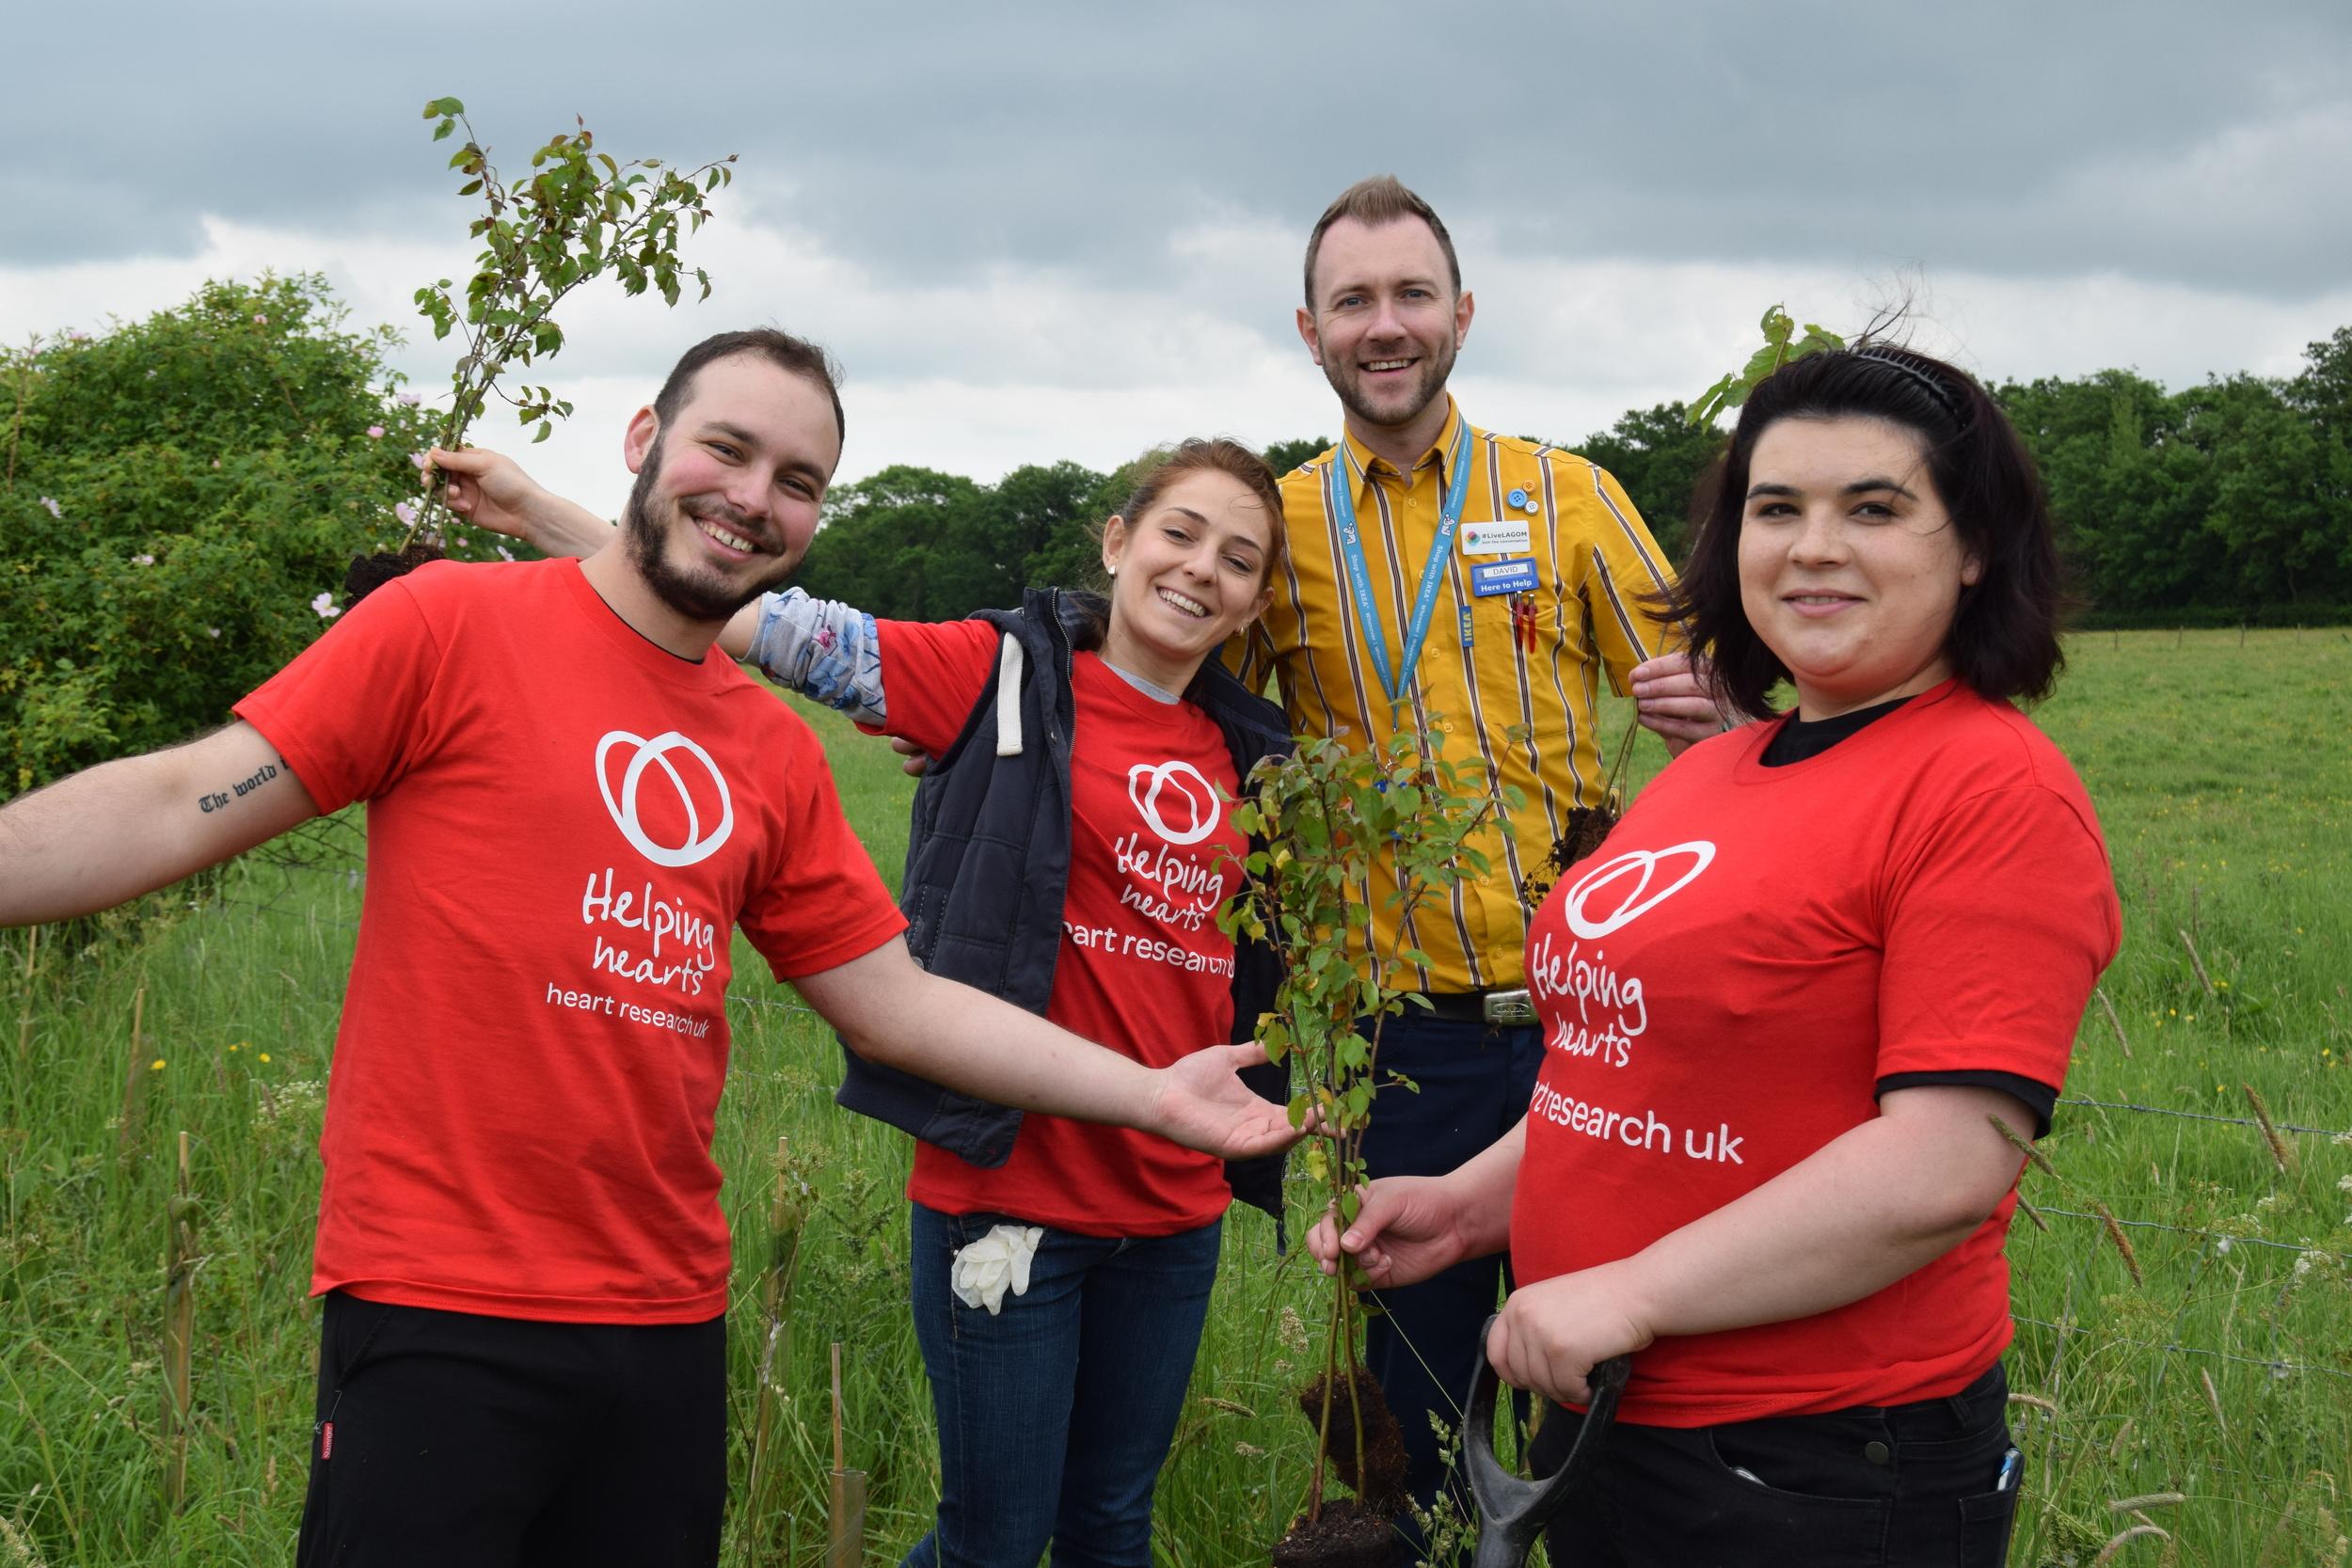 Employee_volunteering_Ikea_Forest _of Hearts.JPG